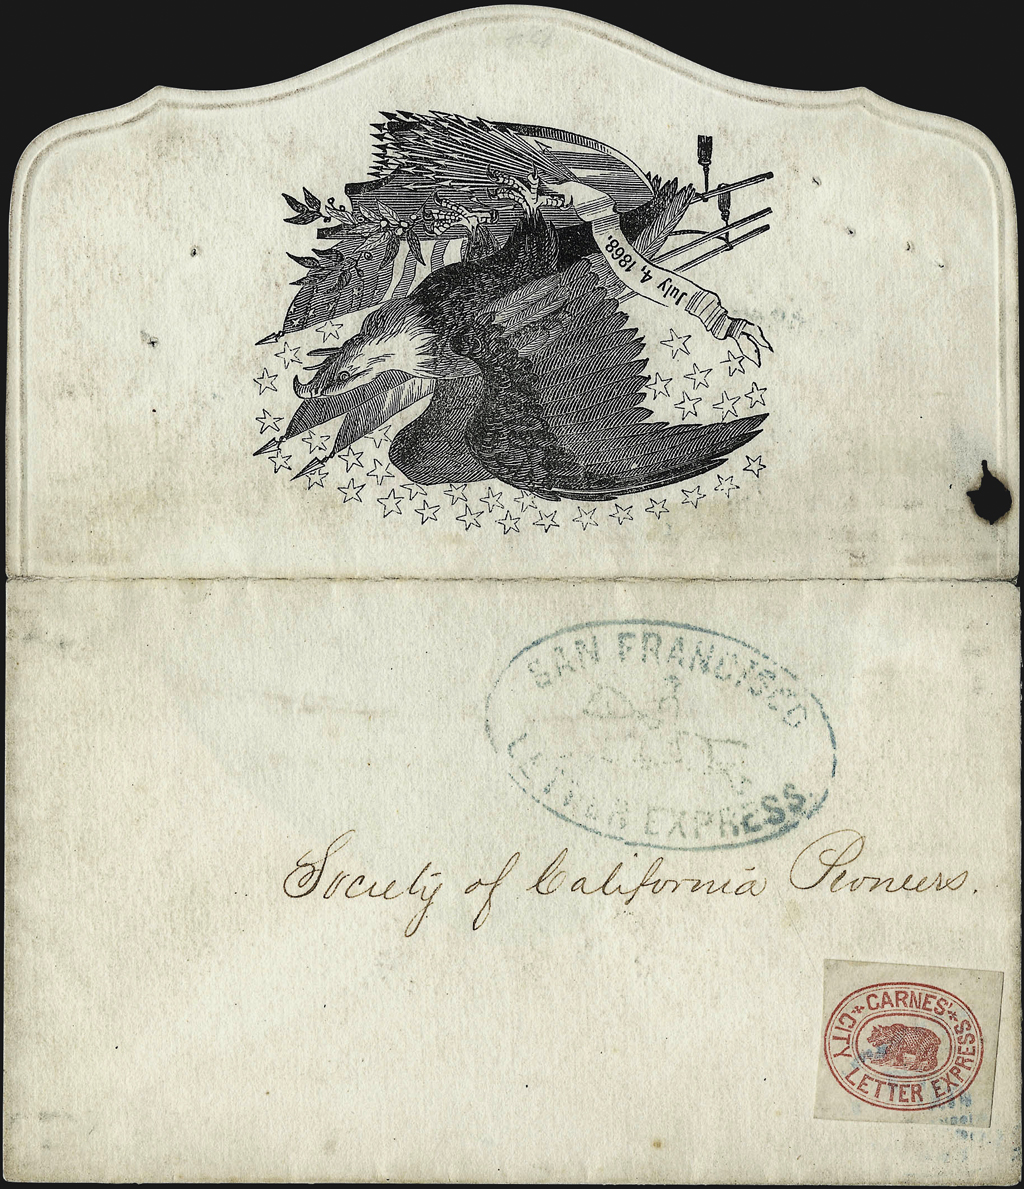 carnes-city-letter-express-cover-1868-siegel-sale-2015